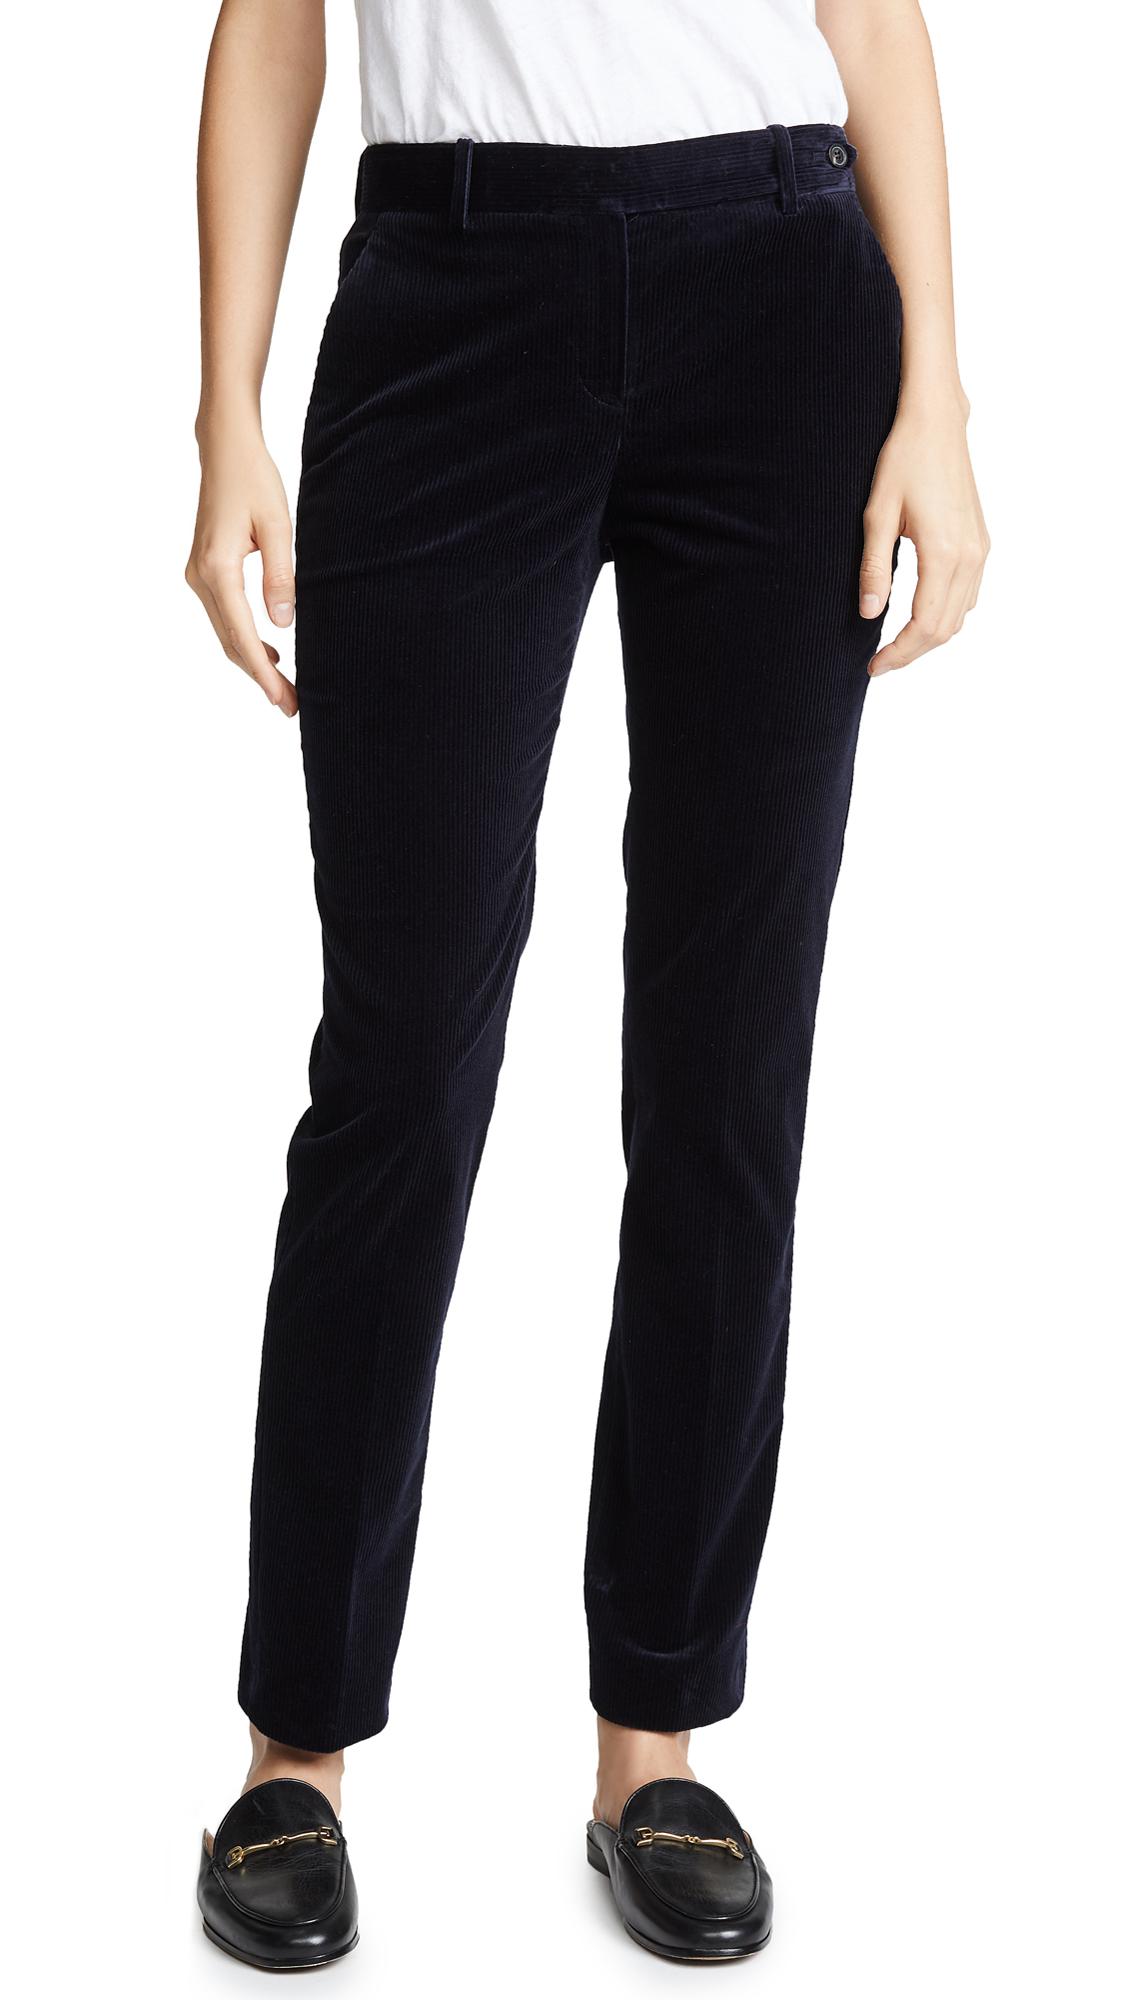 Theory Pintuck Trouser Pants - Deep Navy